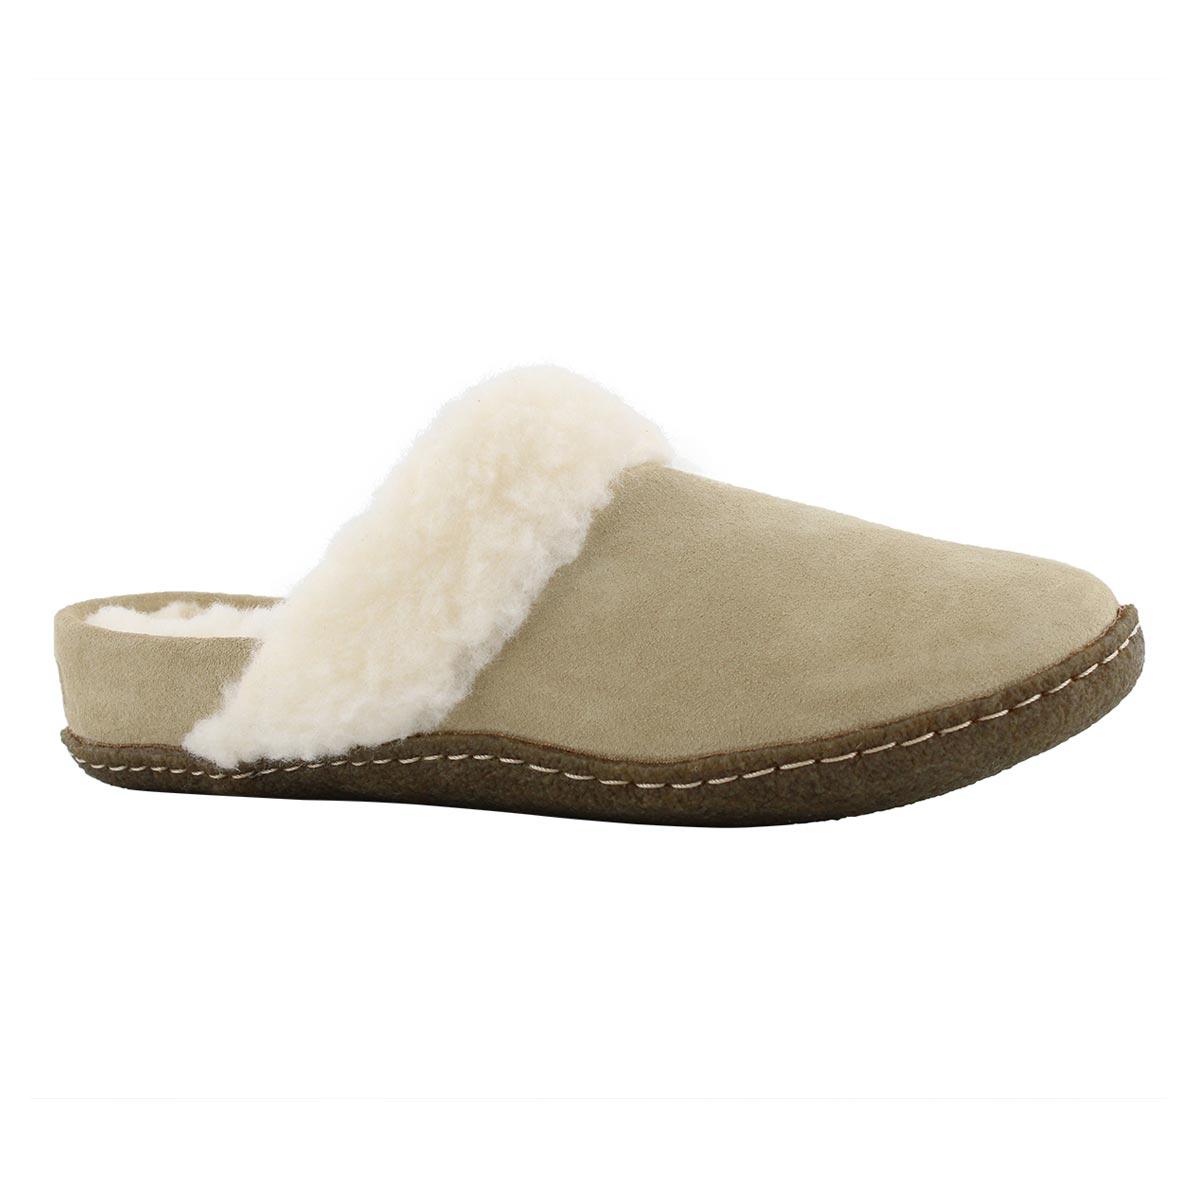 Lds Nakiska Slide II british tan slipper